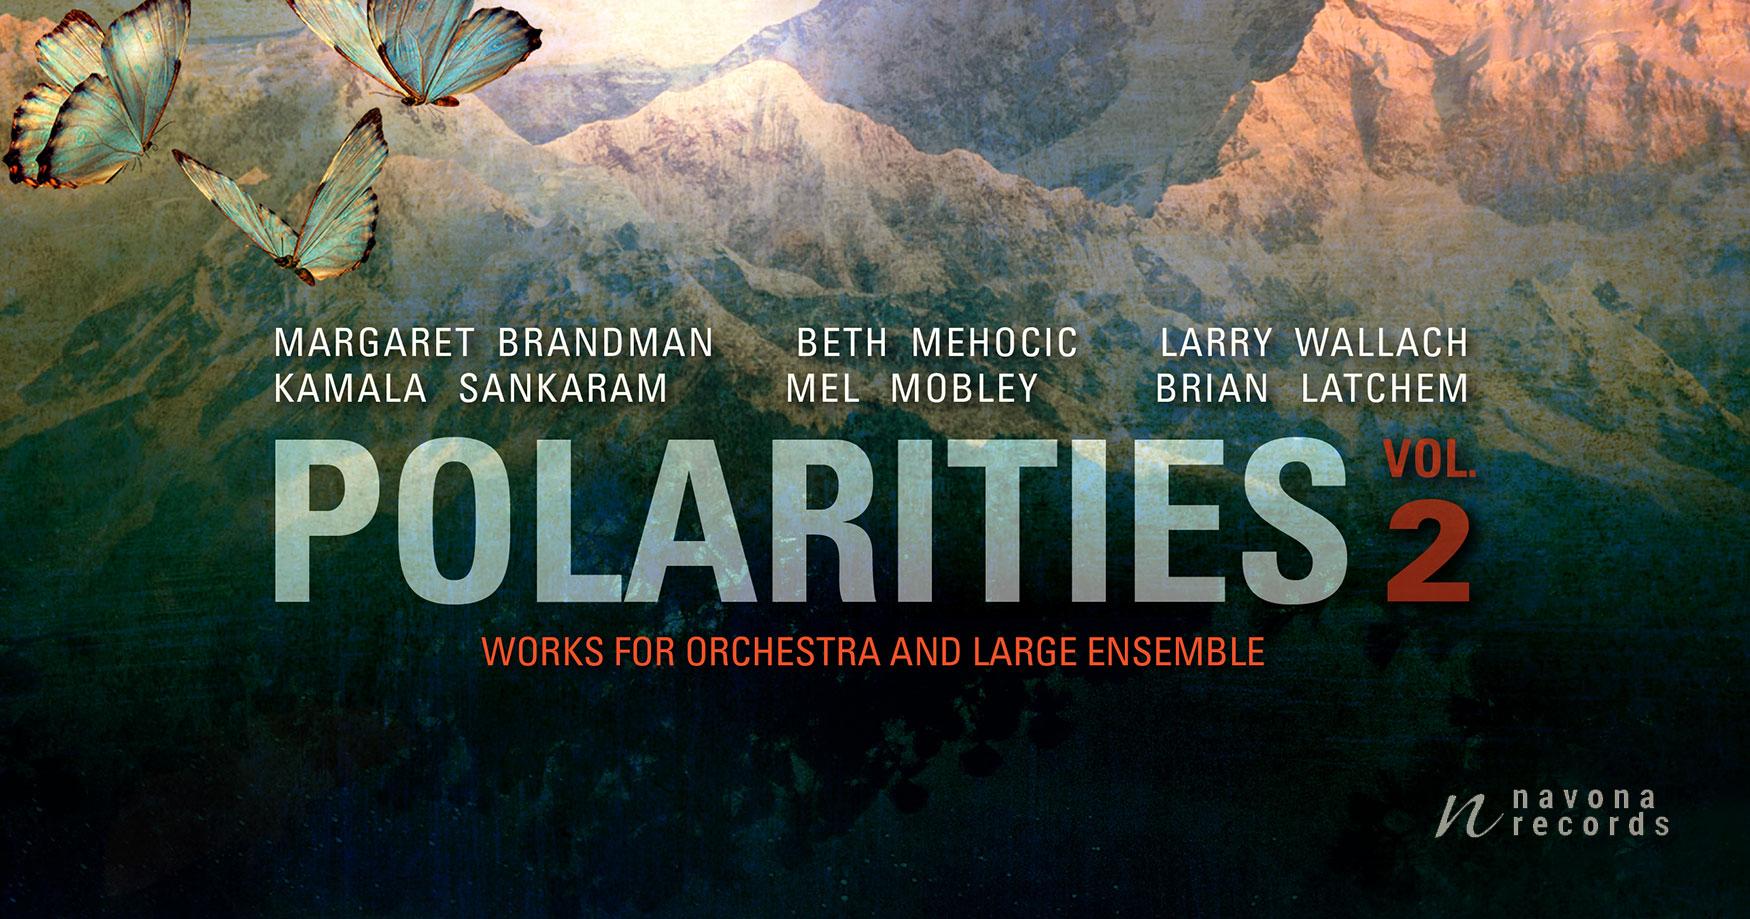 Polarities Vol. 2